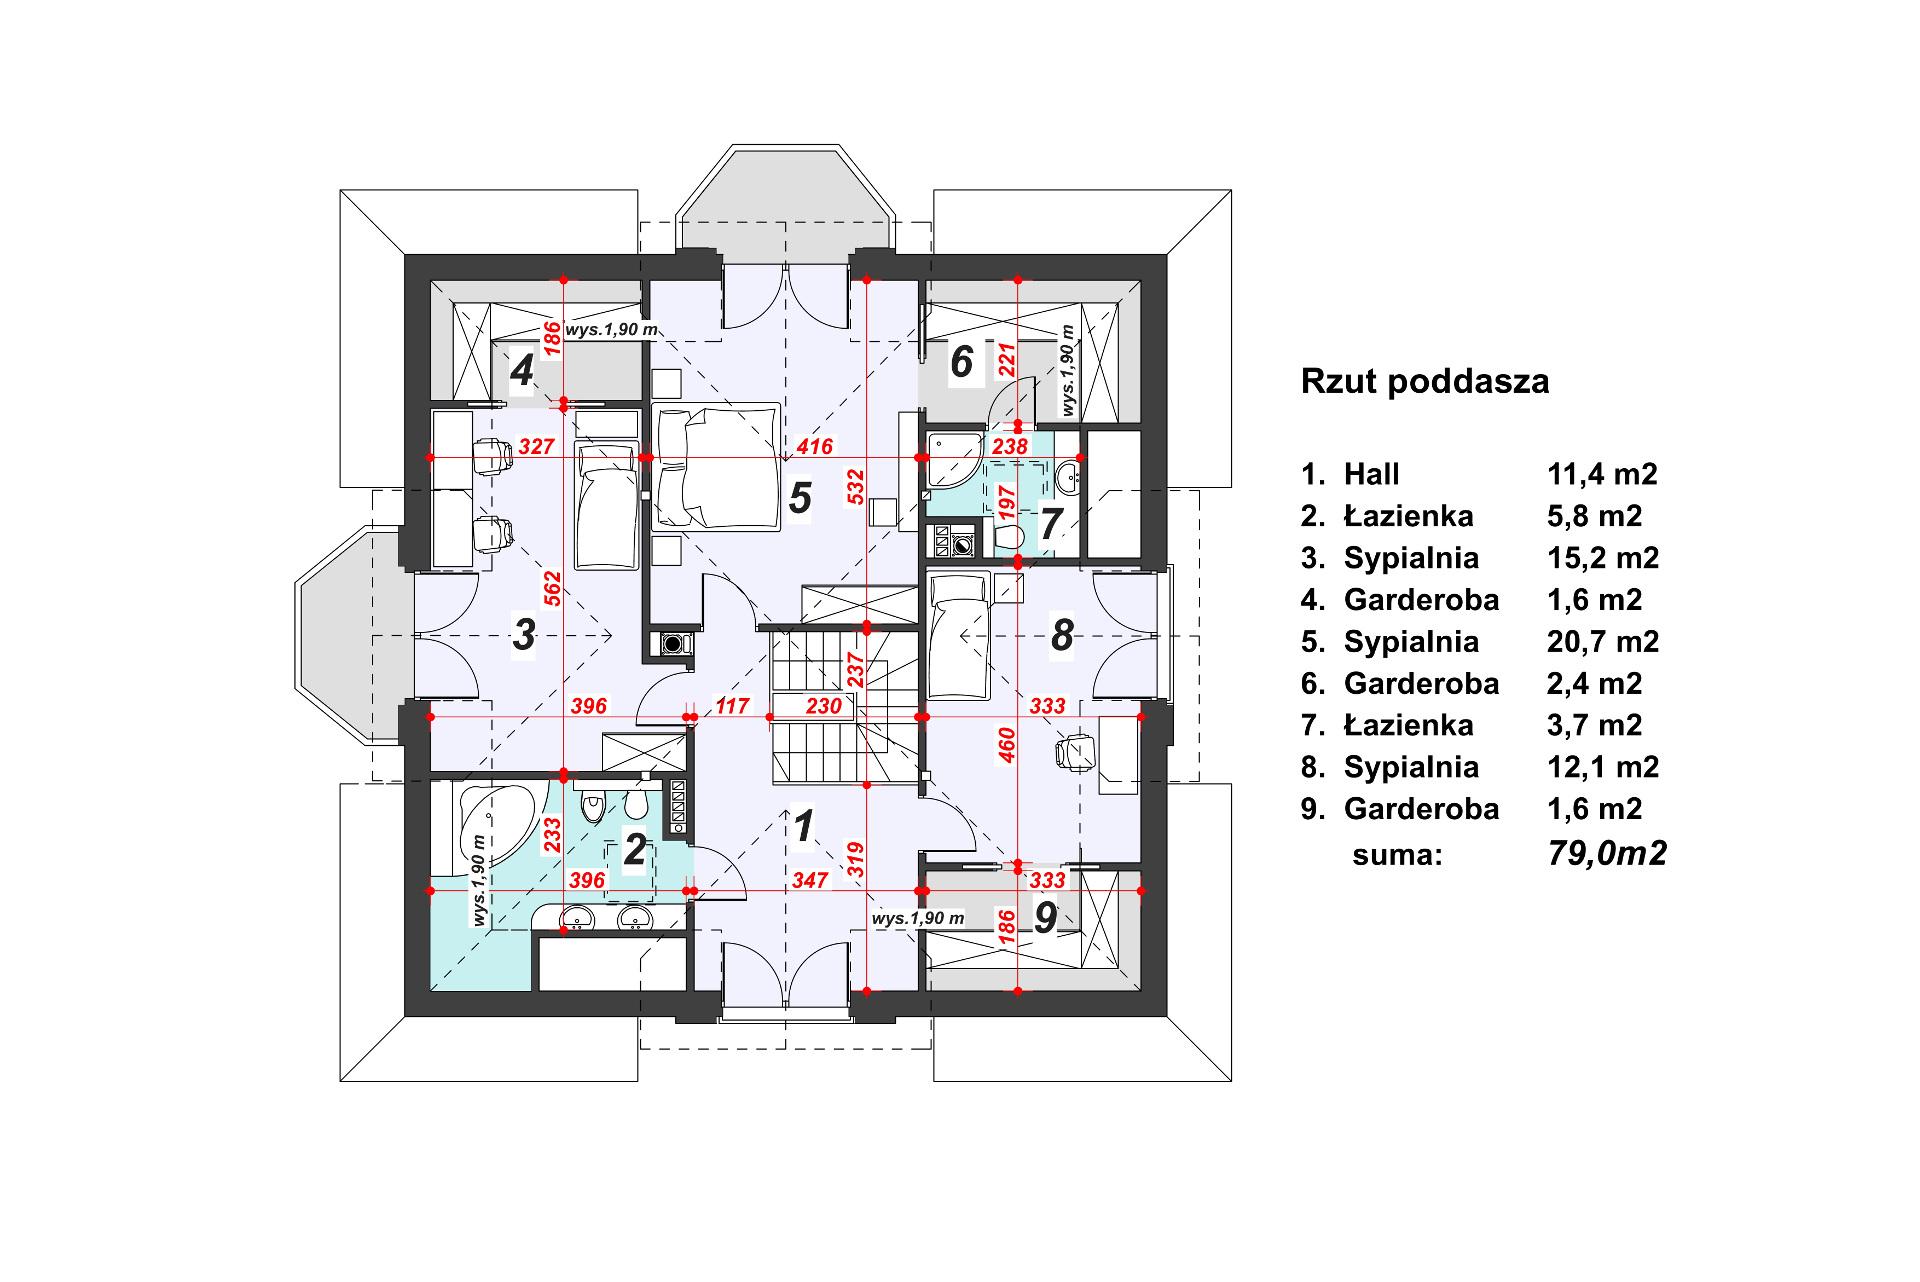 projekt-domu-Tallasea-rzut-poddasza-wymiary.jpg